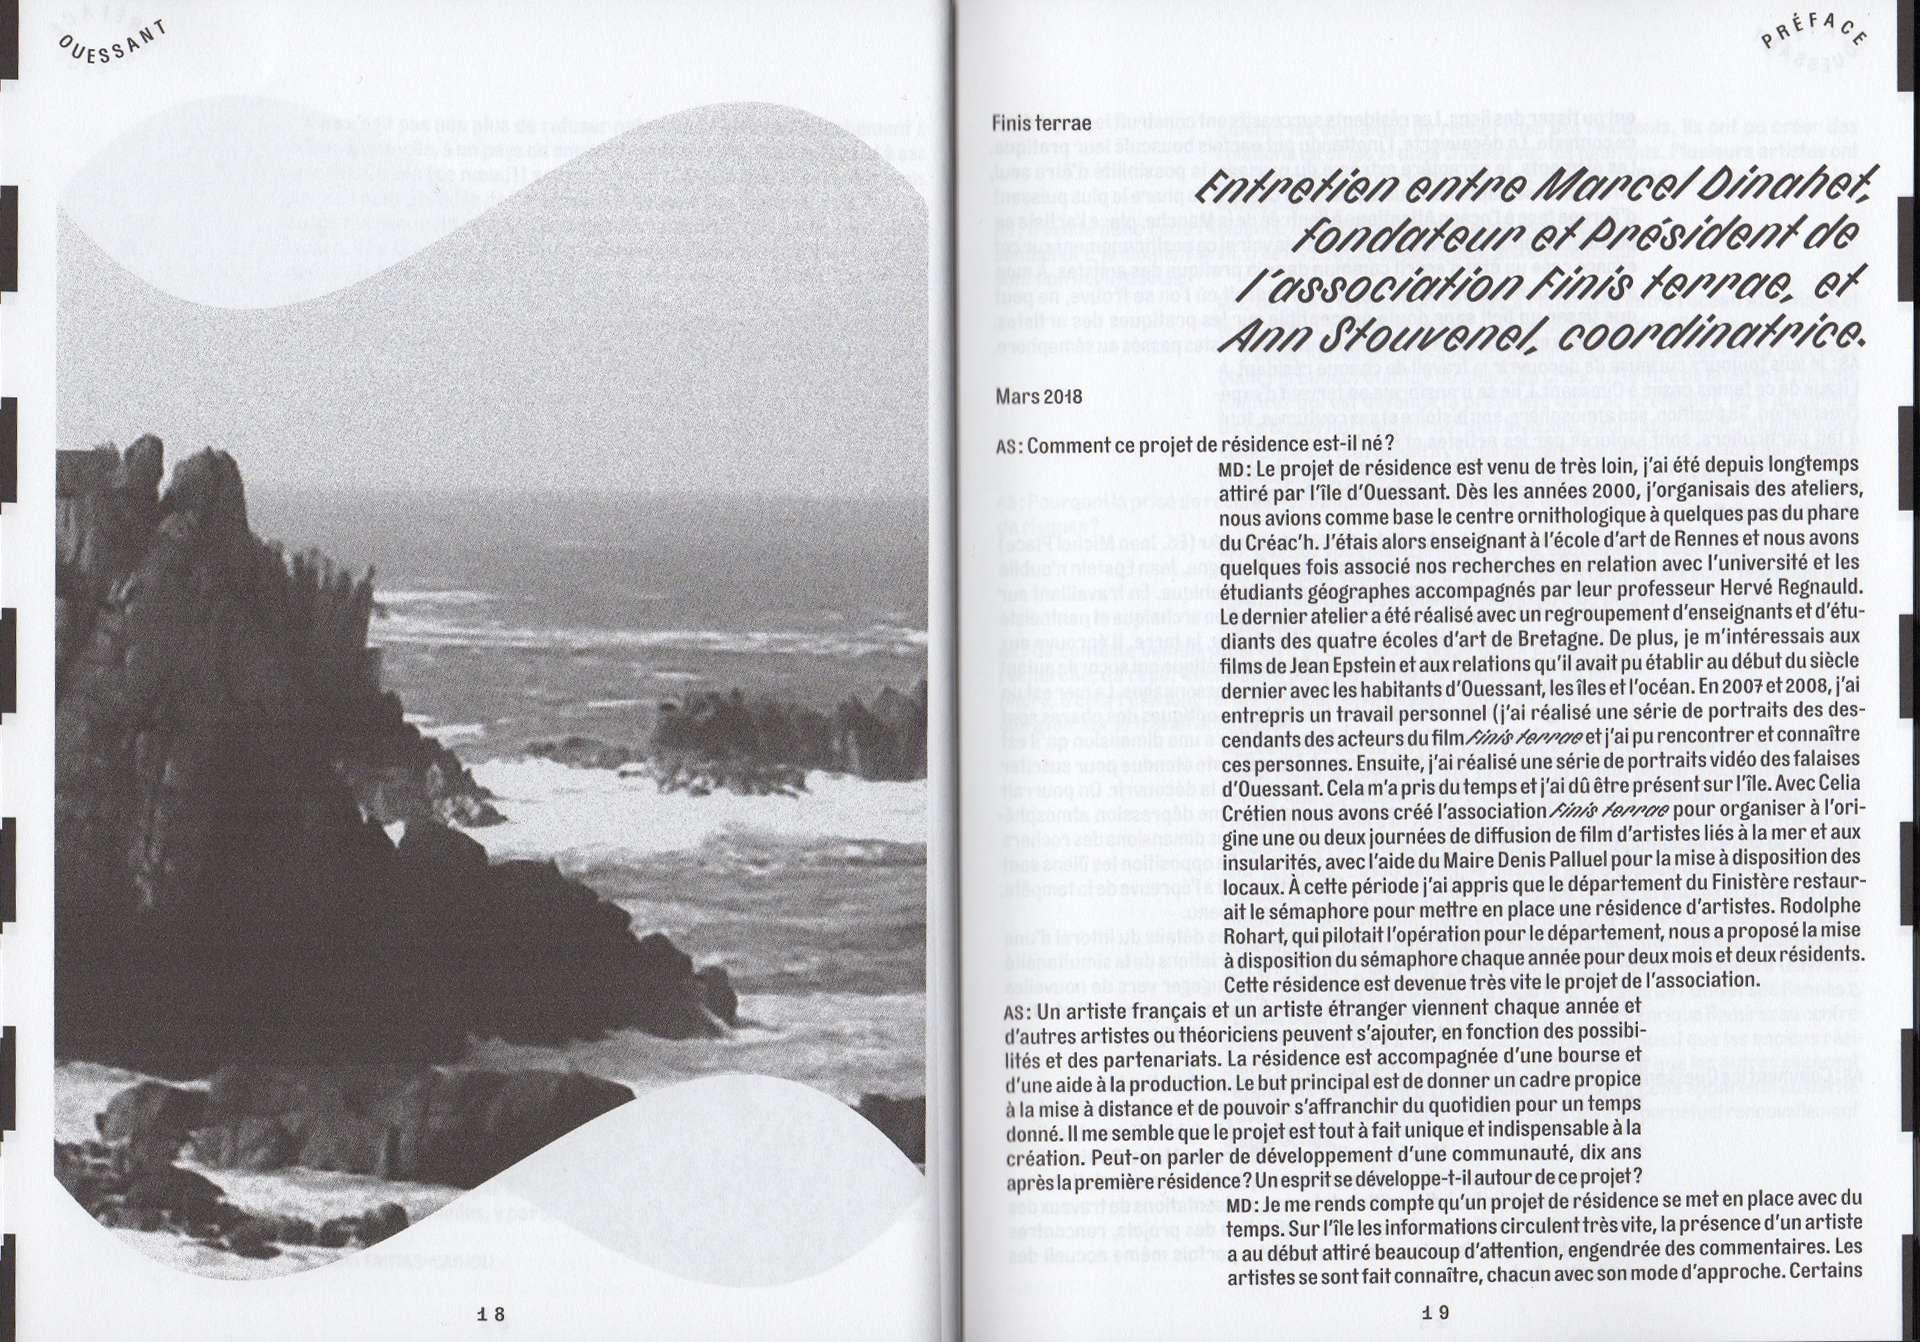 Cyril Makhoul - Ouessant — Catalogue de résidence (link: http://www.finis-terrae.fr/ text: Finis terrae).